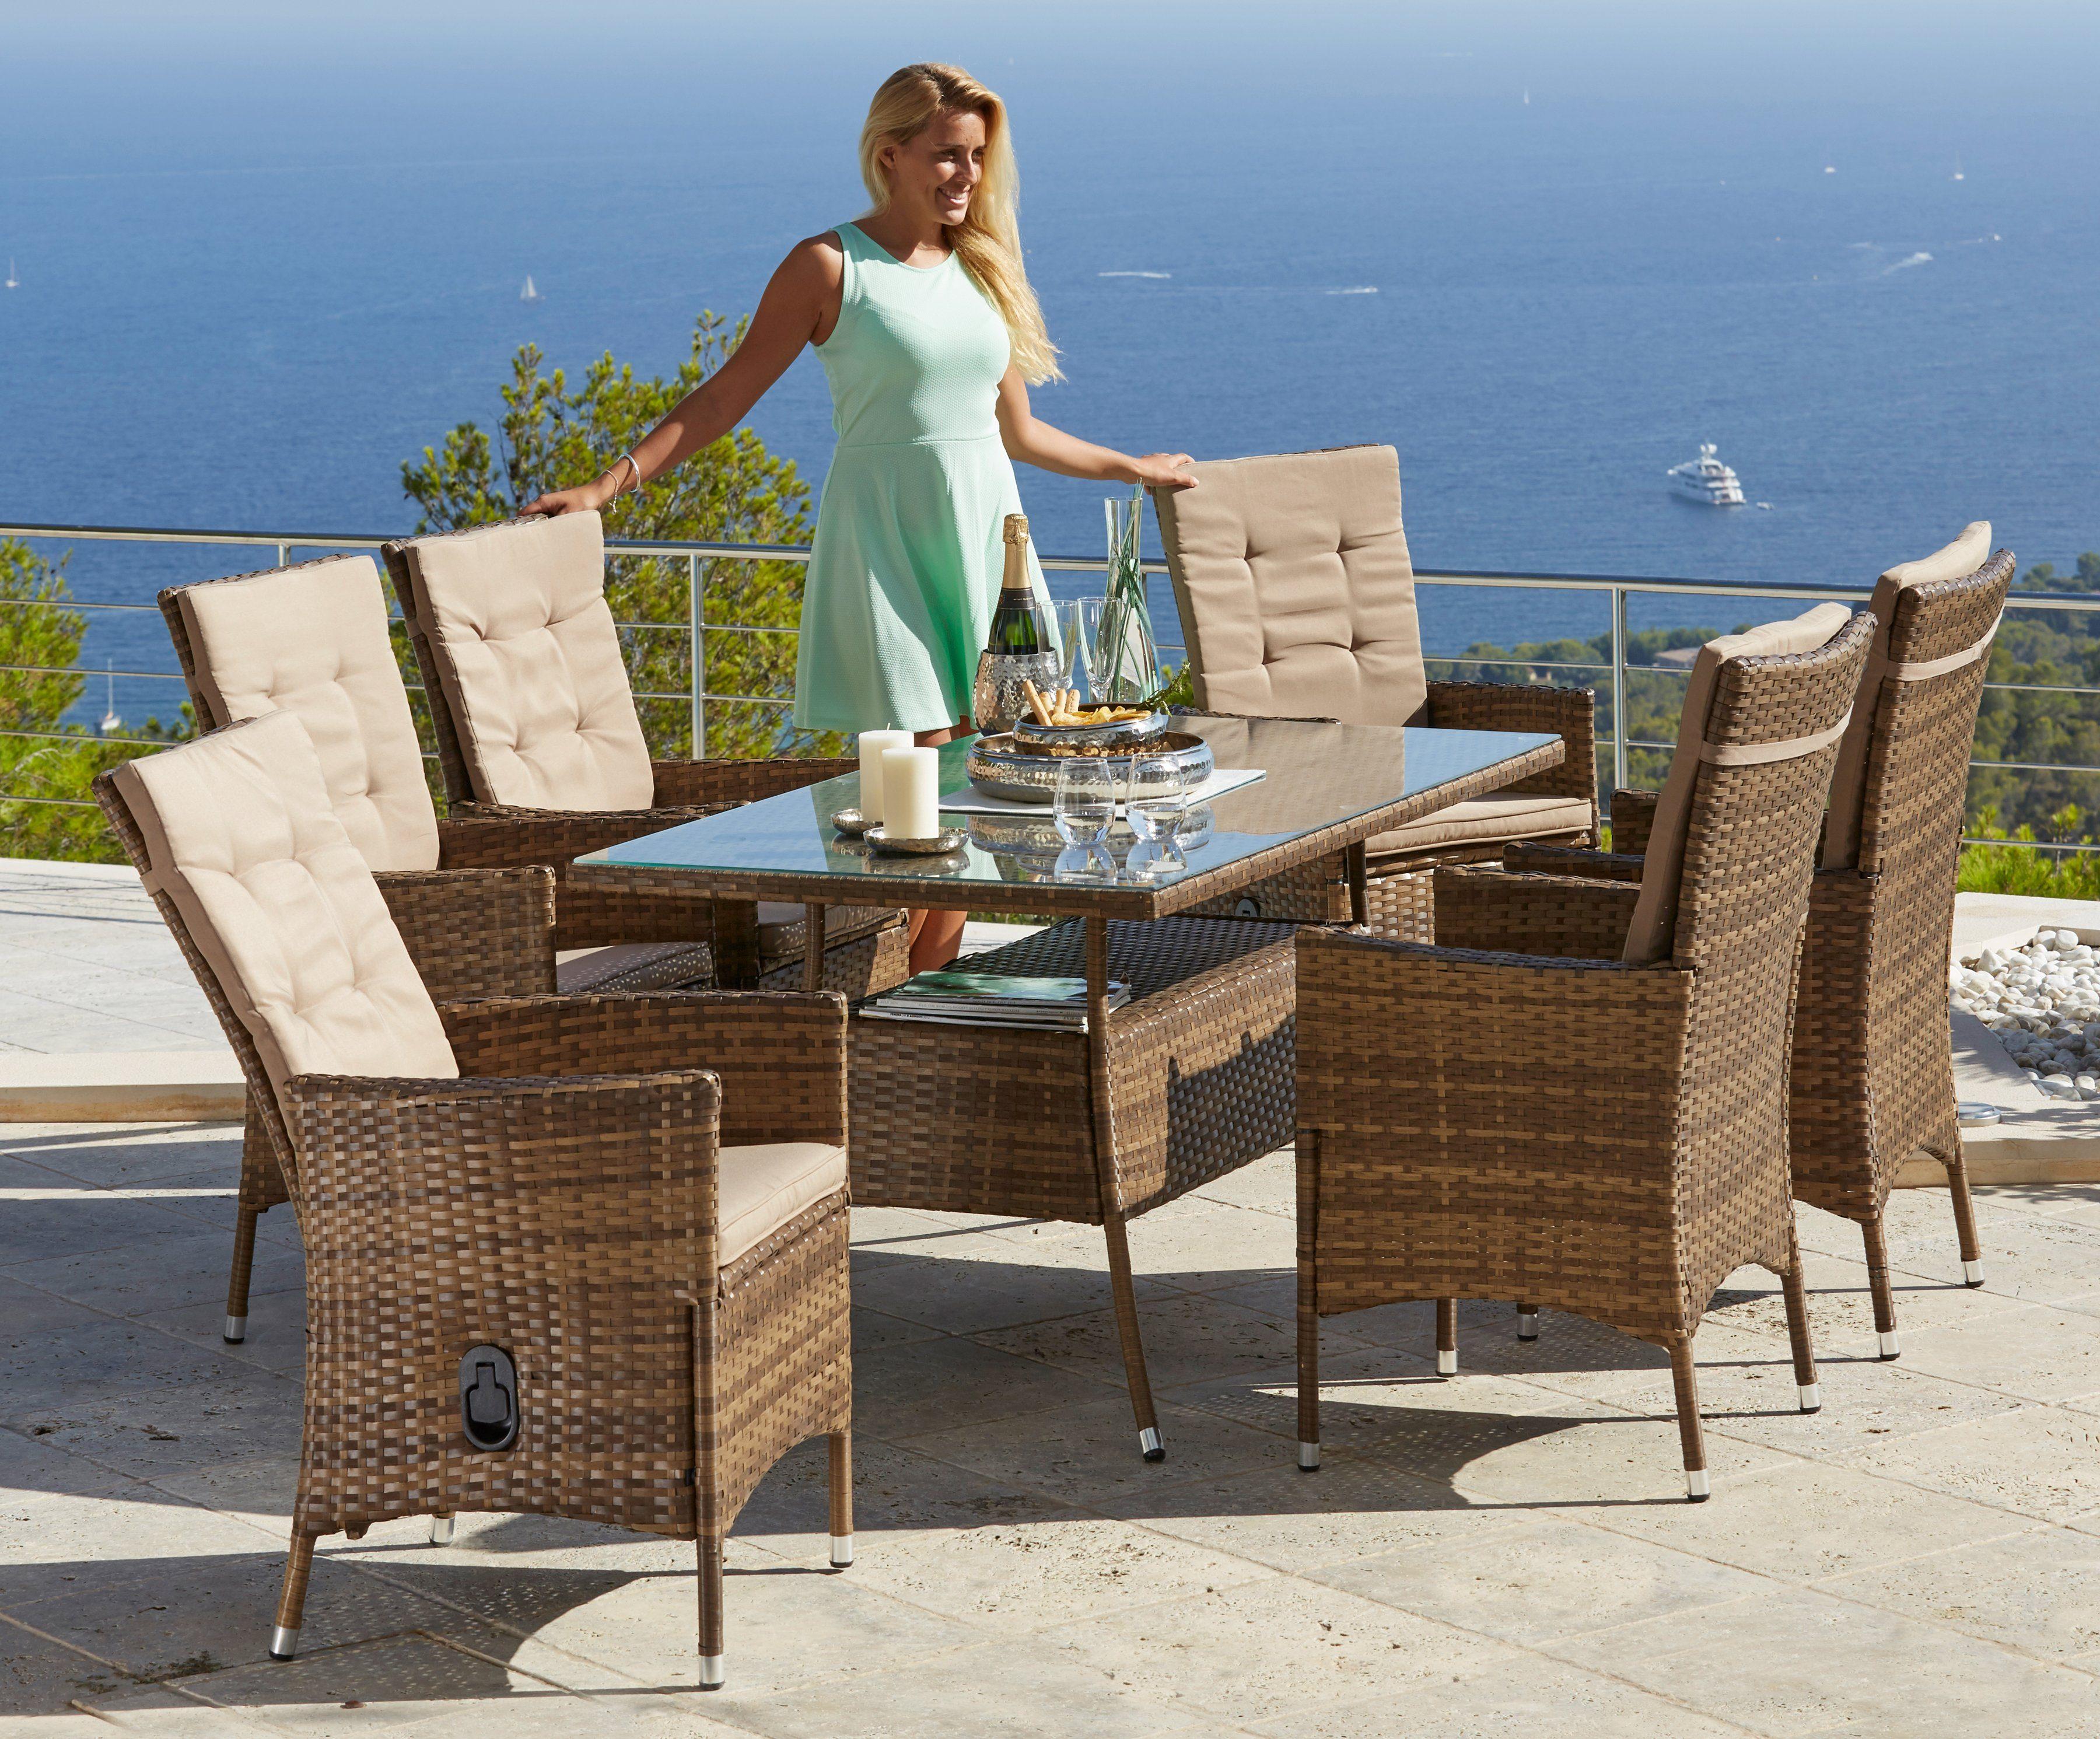 Gartenmobel Edelstahl Oder Aluminium : Gartenmöbelset »Santiago Deluxe«, 6 Hochlehner, Tisch 150×80 cm